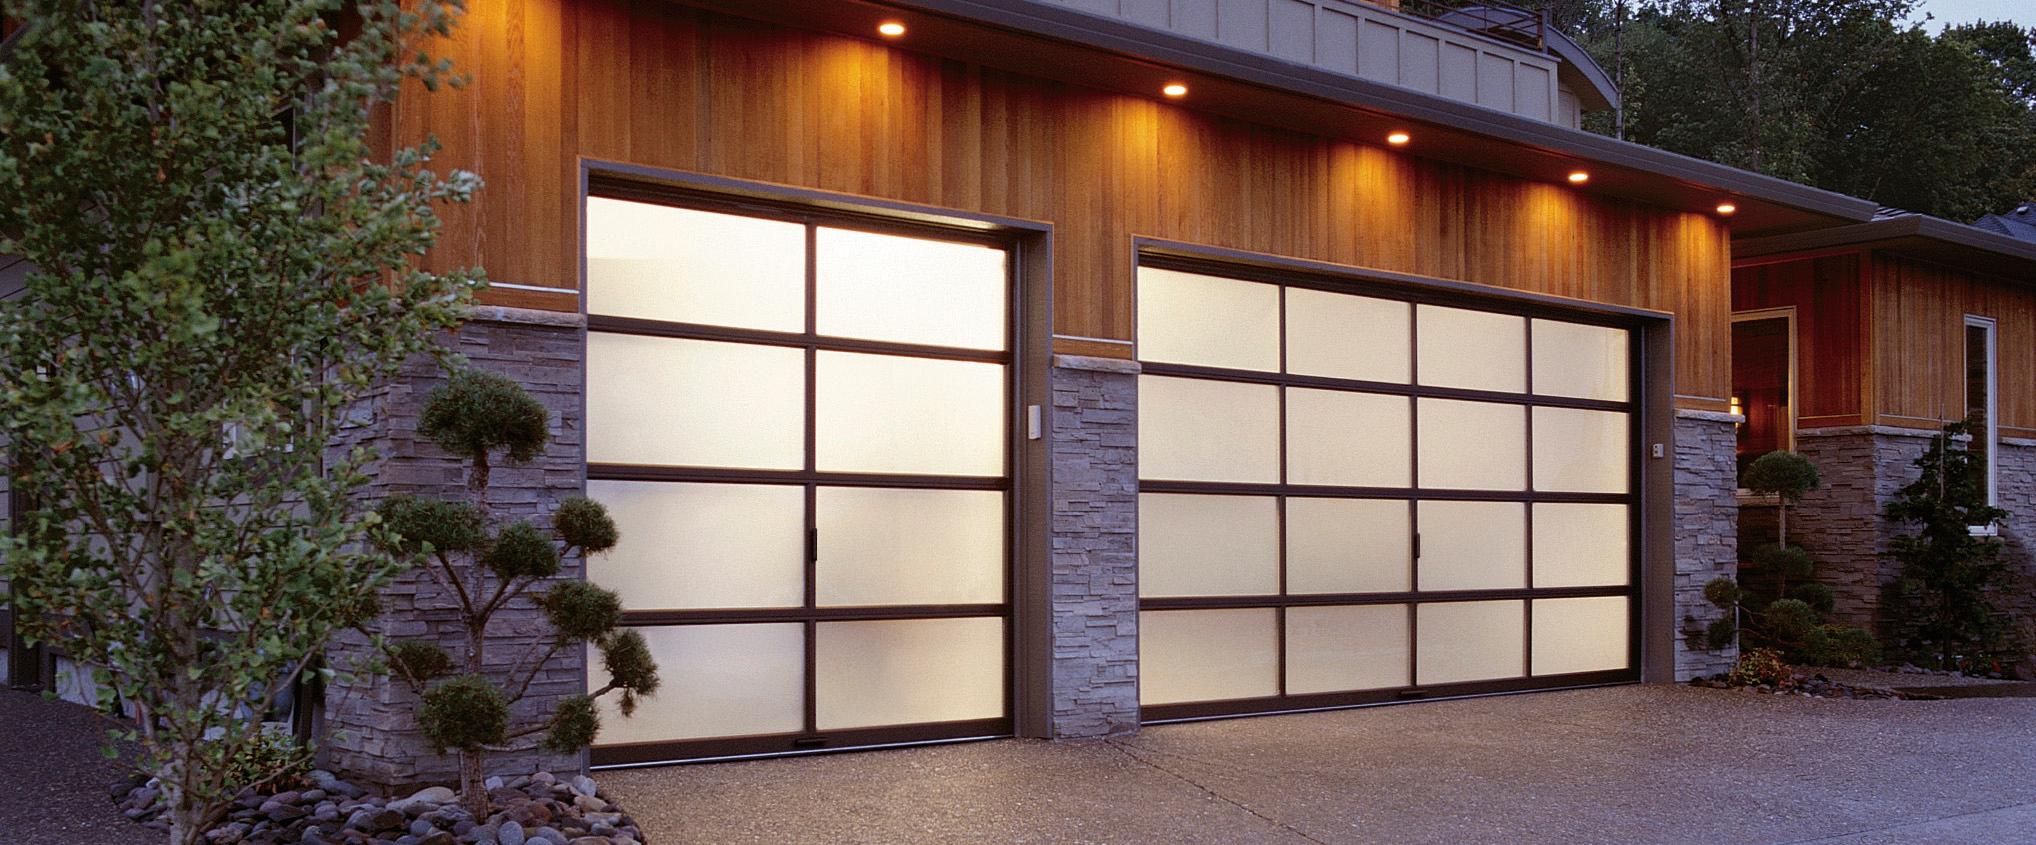 Duval Overhead Doors, Inc. image 0